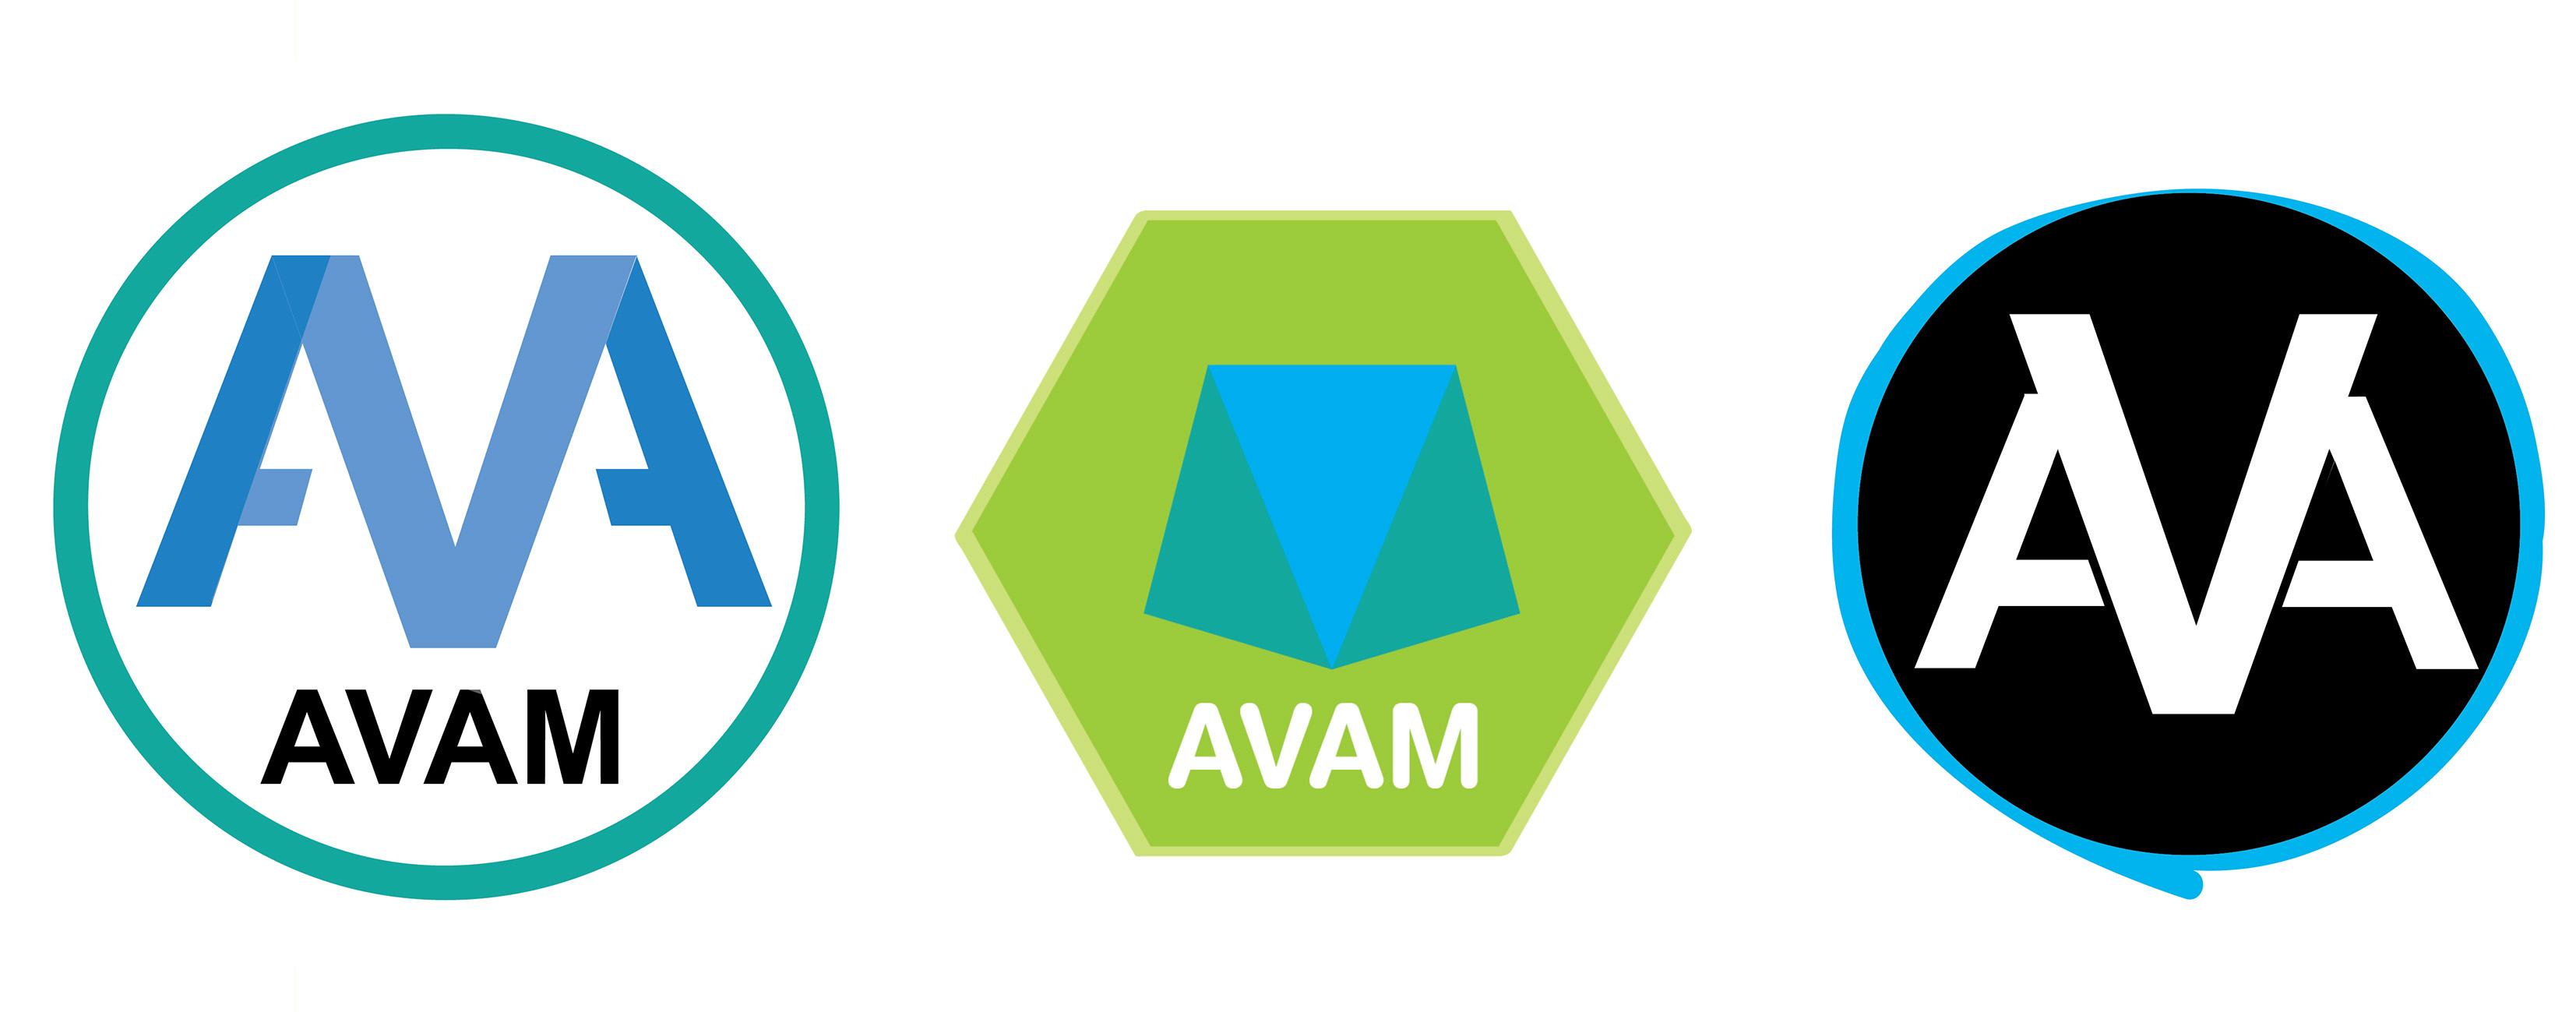 Avam Logos<div style='clear:both;width:100%;height:0px;'></div><span class='cat'>Logo</span>